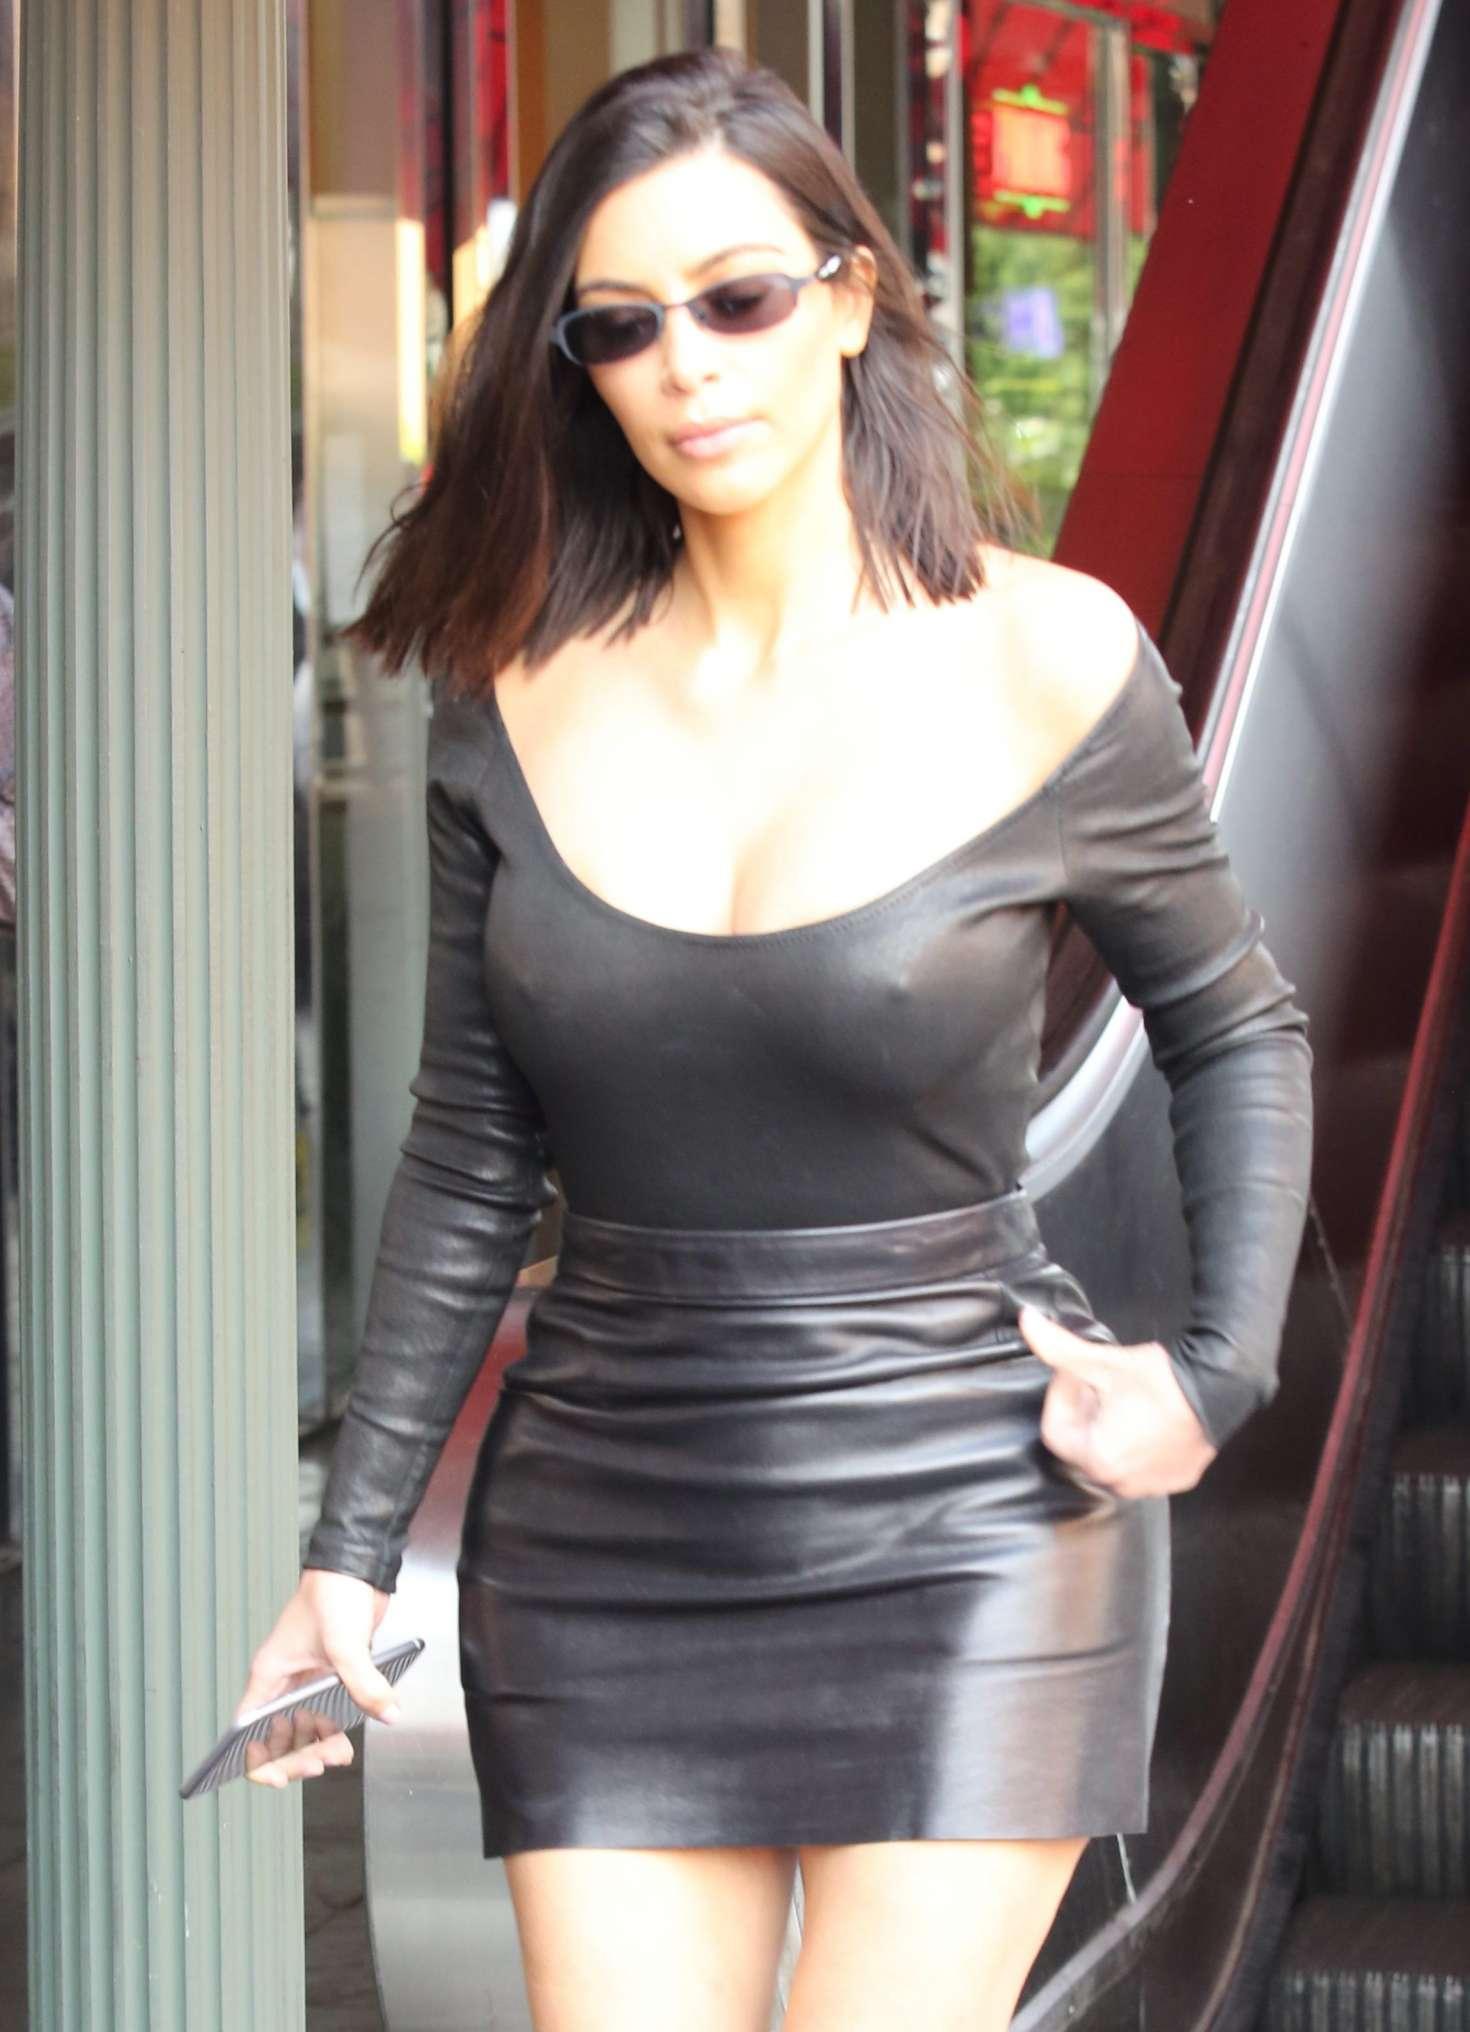 Kim Kardashian In Leather Skirt 14 Gotceleb